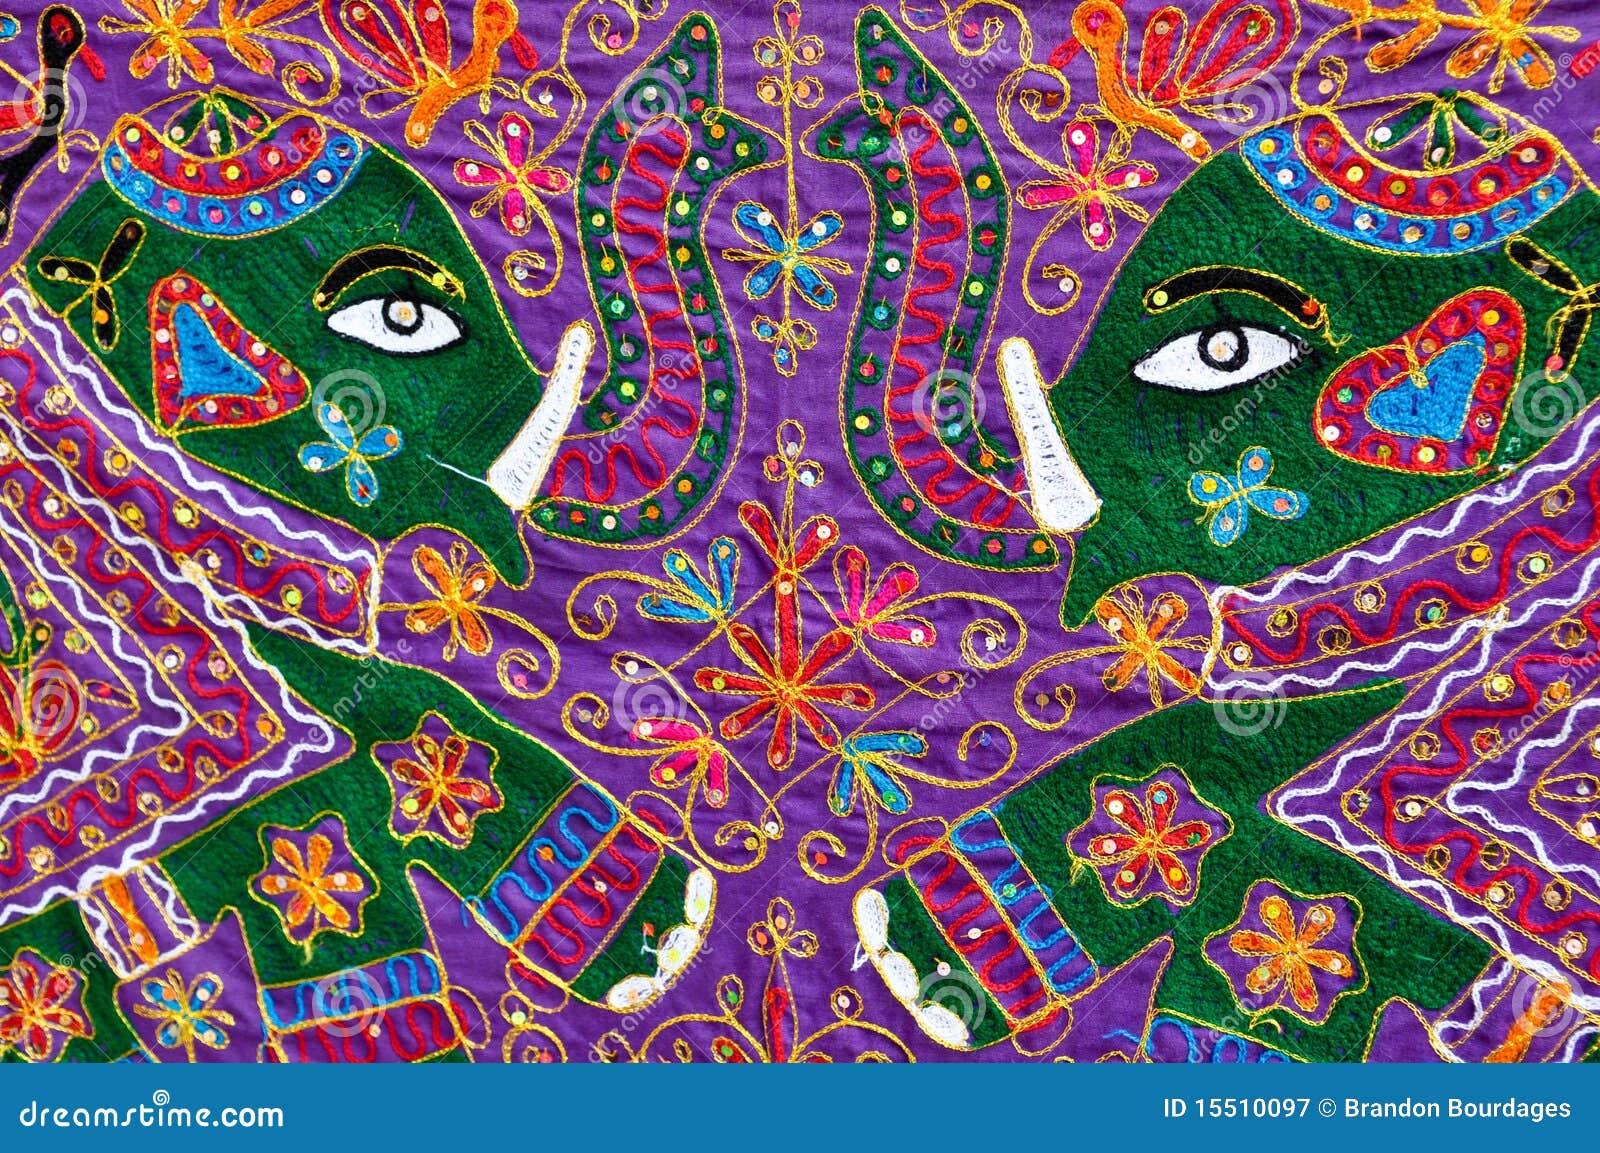 Elephant On Indian Fabric Stock Image Image Of Colorful